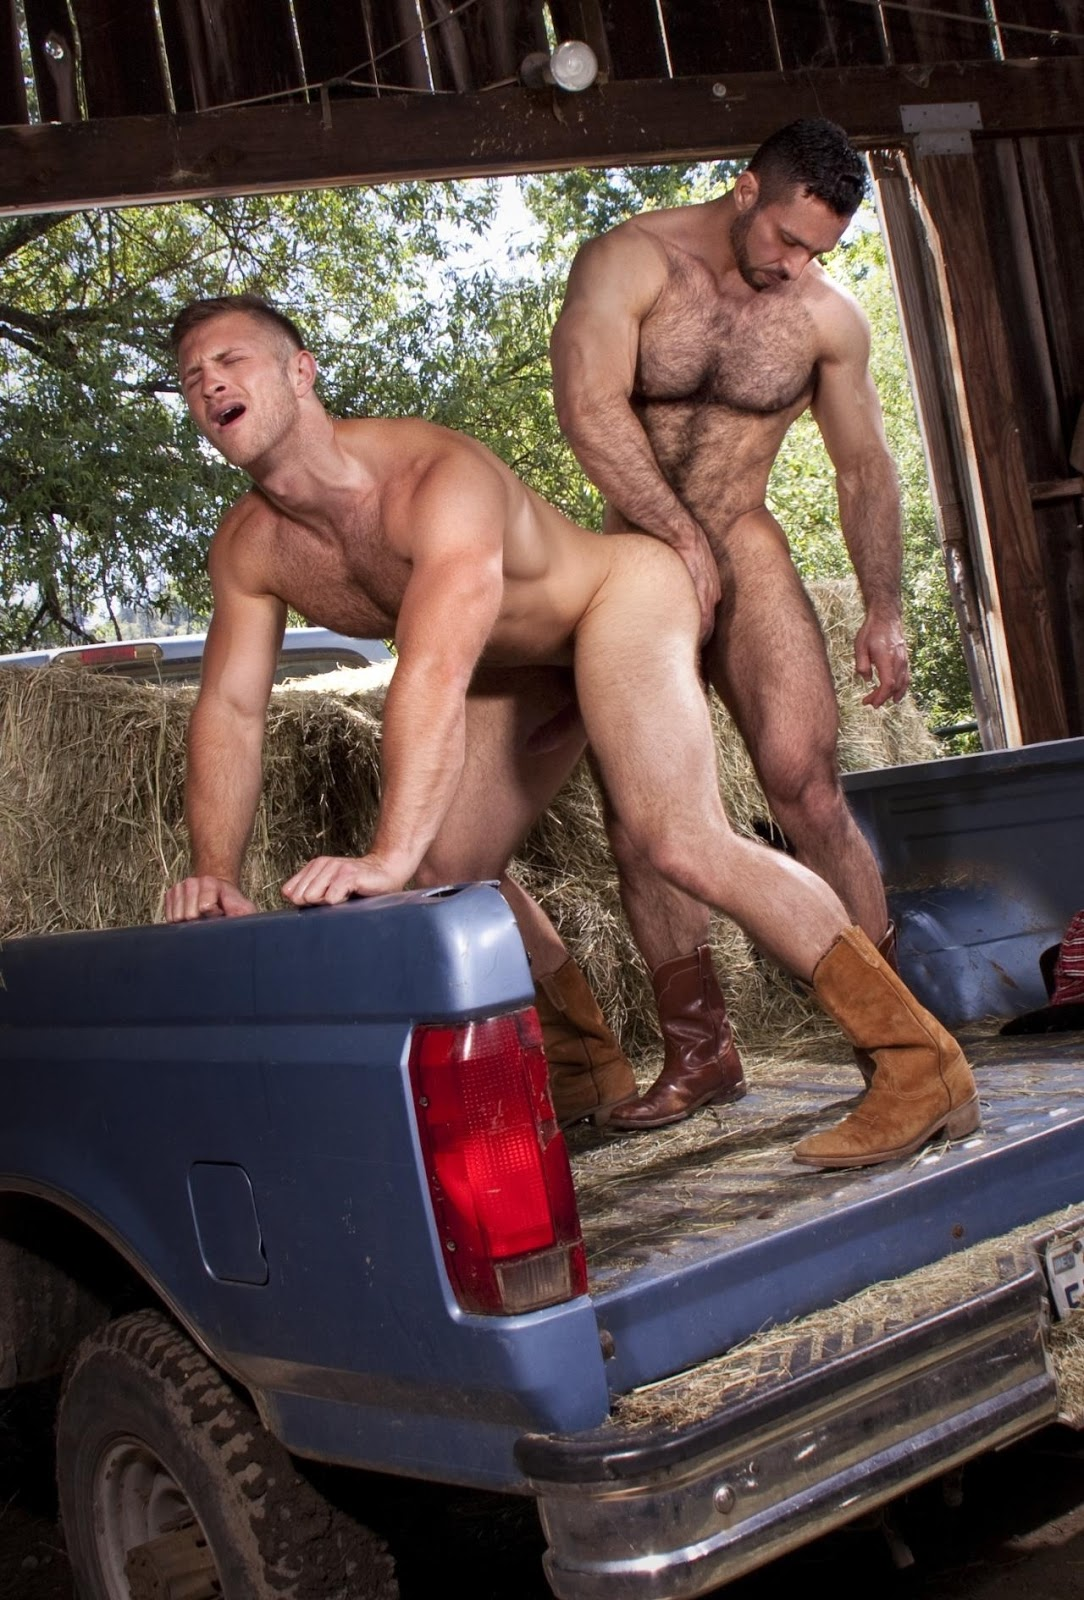 Gay cowboy rape porn